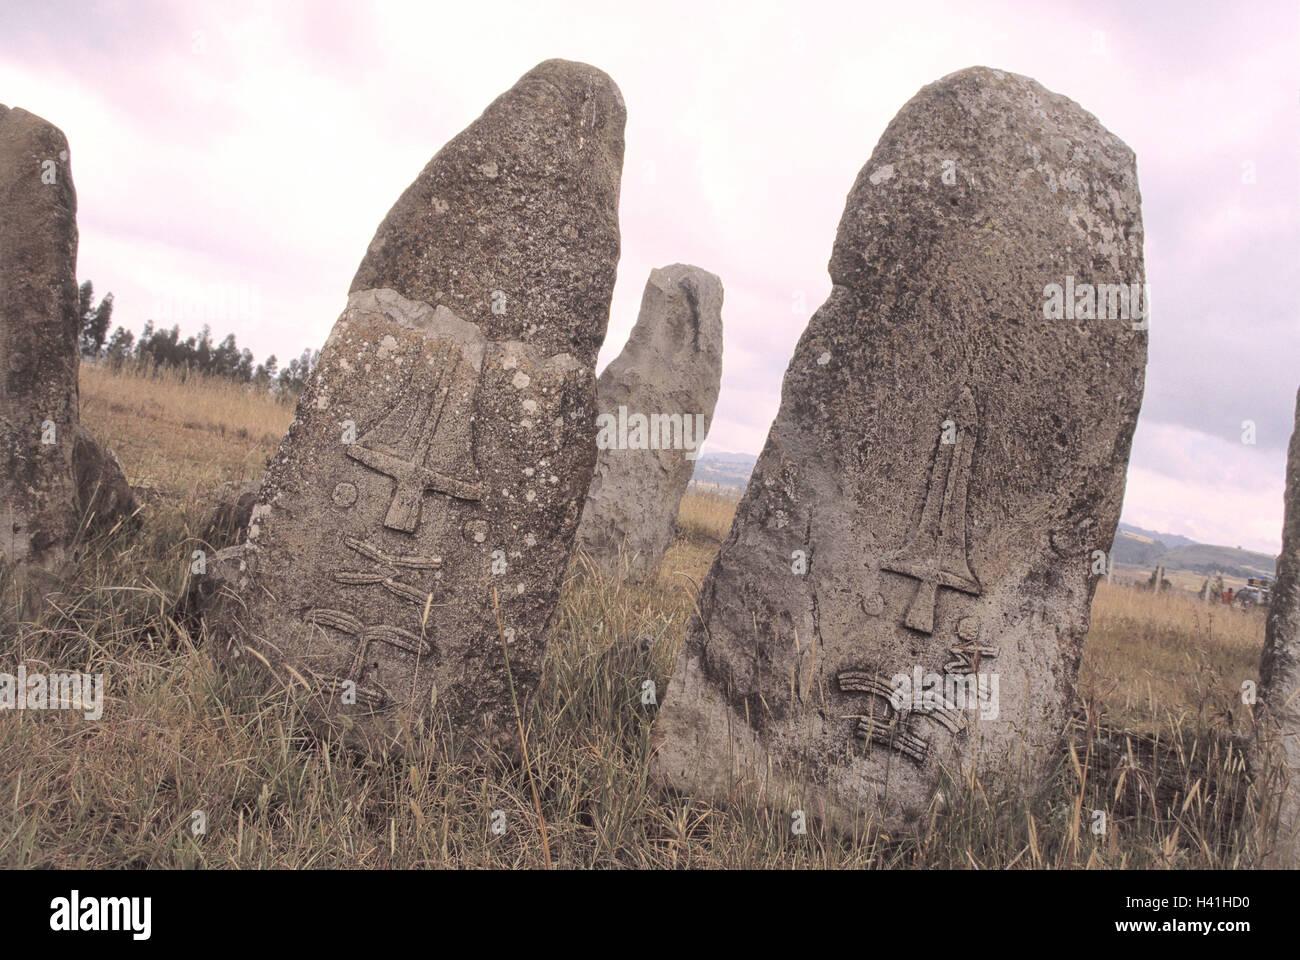 Ethiopia, Tiya, monoliths, Africa, north-east, Africa, Ityopia, south Ethiopia, Teya, Sodo region, UNESCO-world - Stock Image